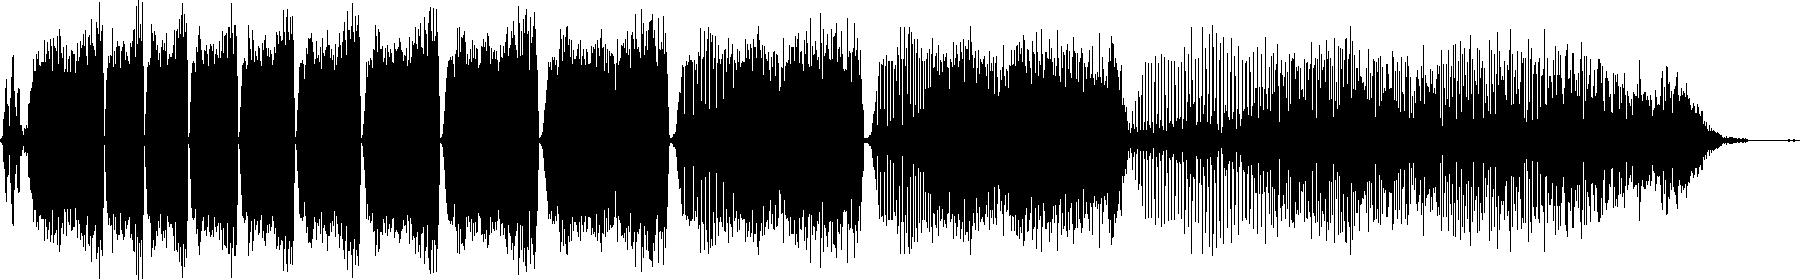 vinyl rewind